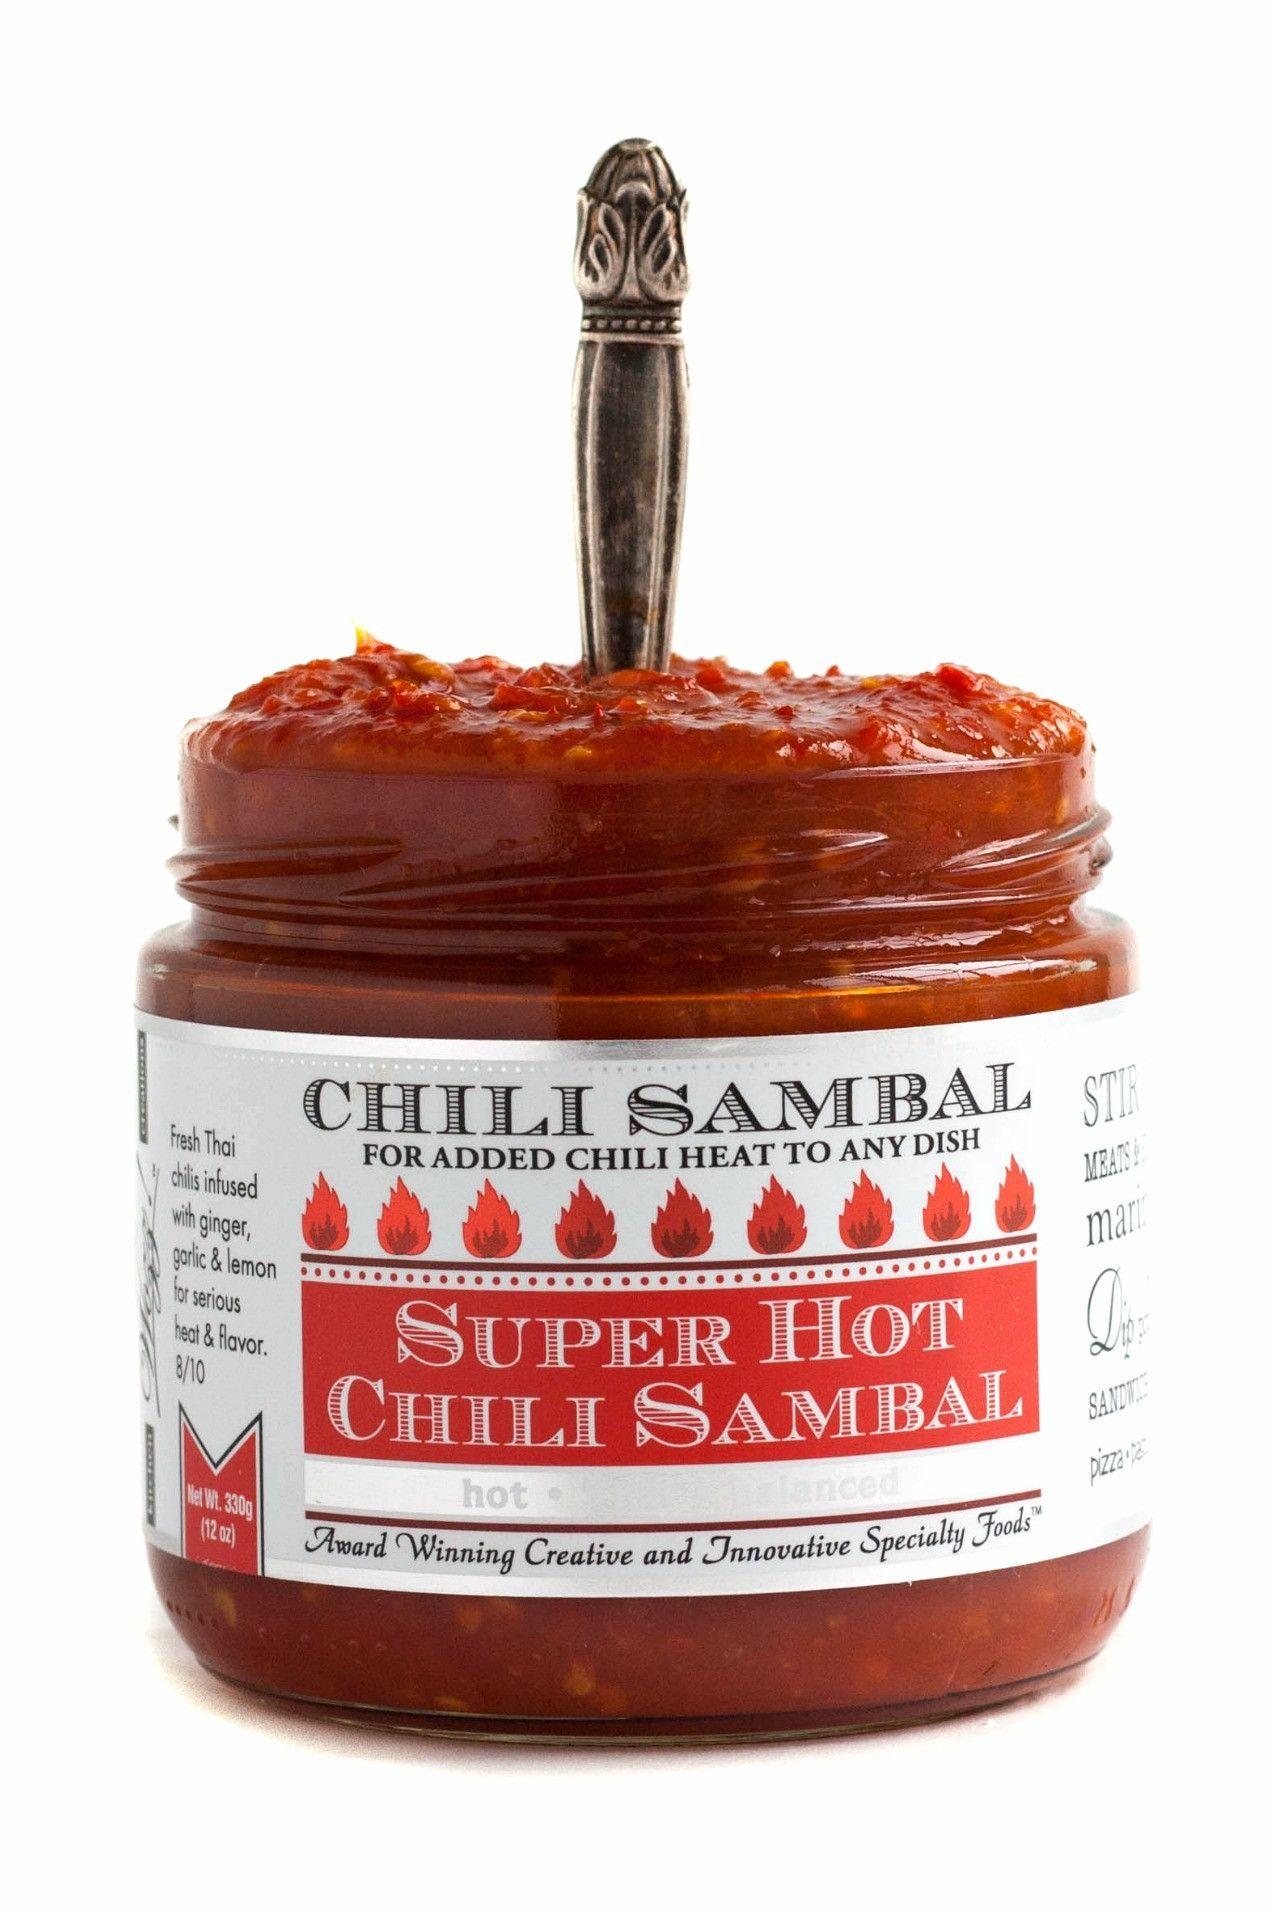 Super Hot Chili Sambal